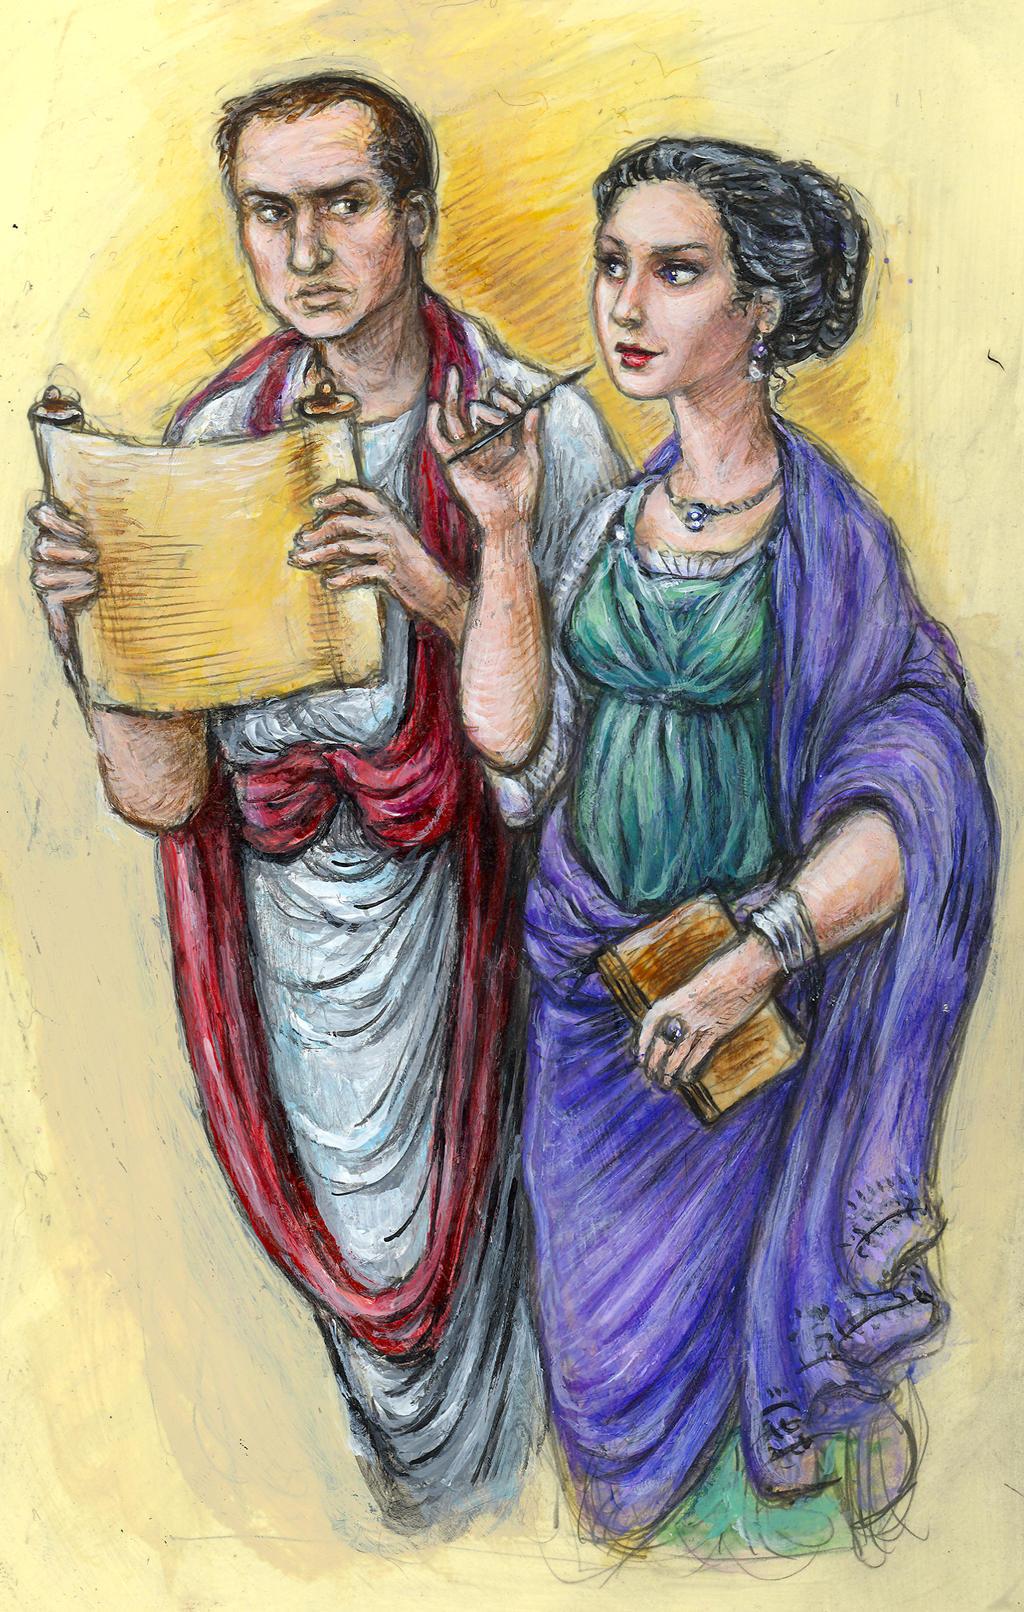 Cicero and Clodia II by suburbanbeatnik